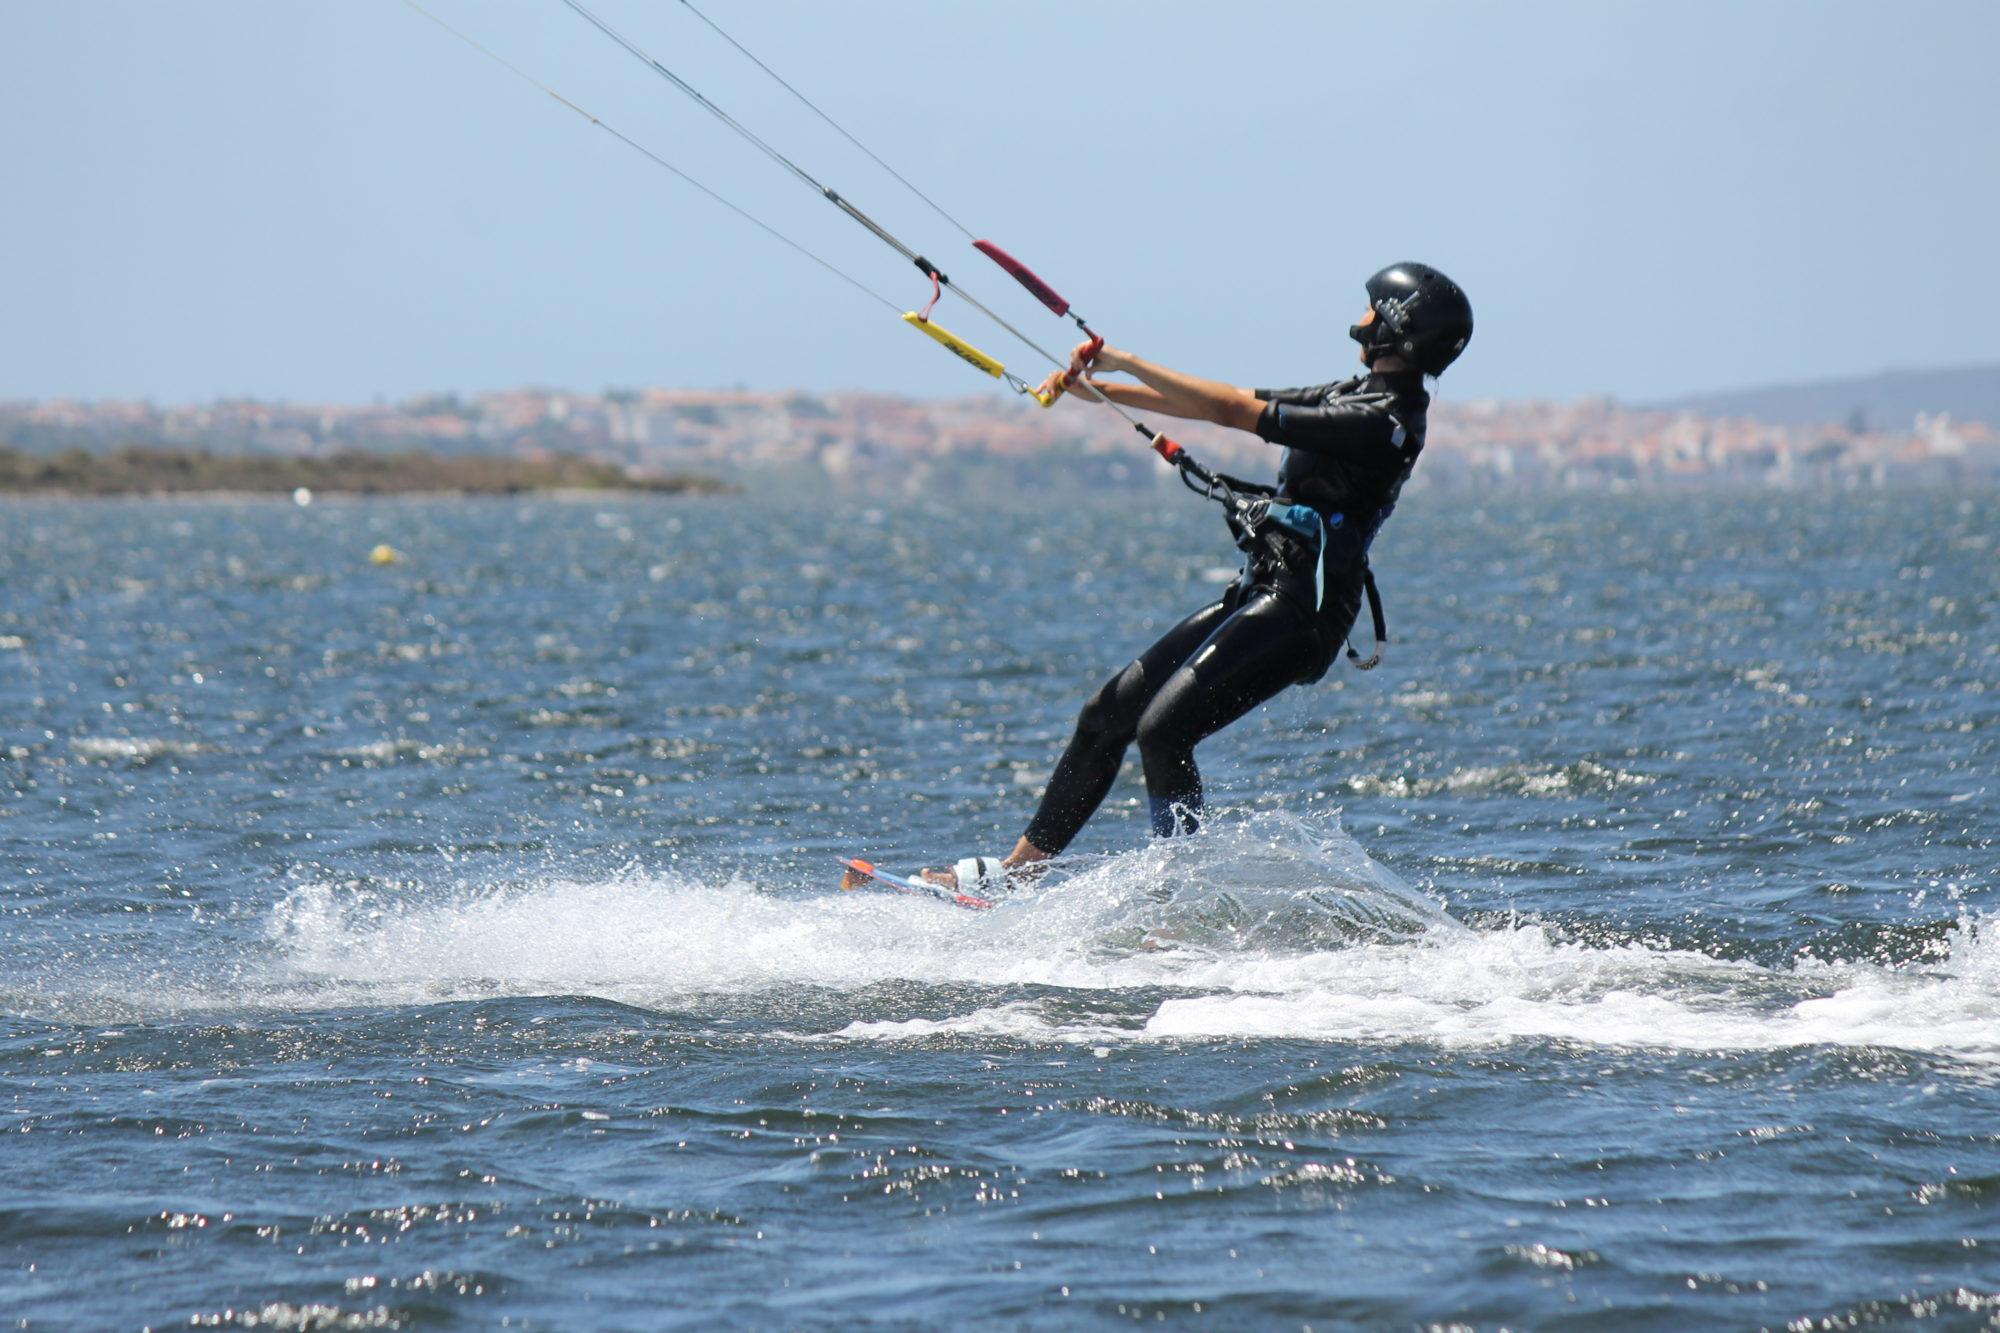 Kitesurfing Punta Trettu Sardinia, my Zero to Hero Kite Course